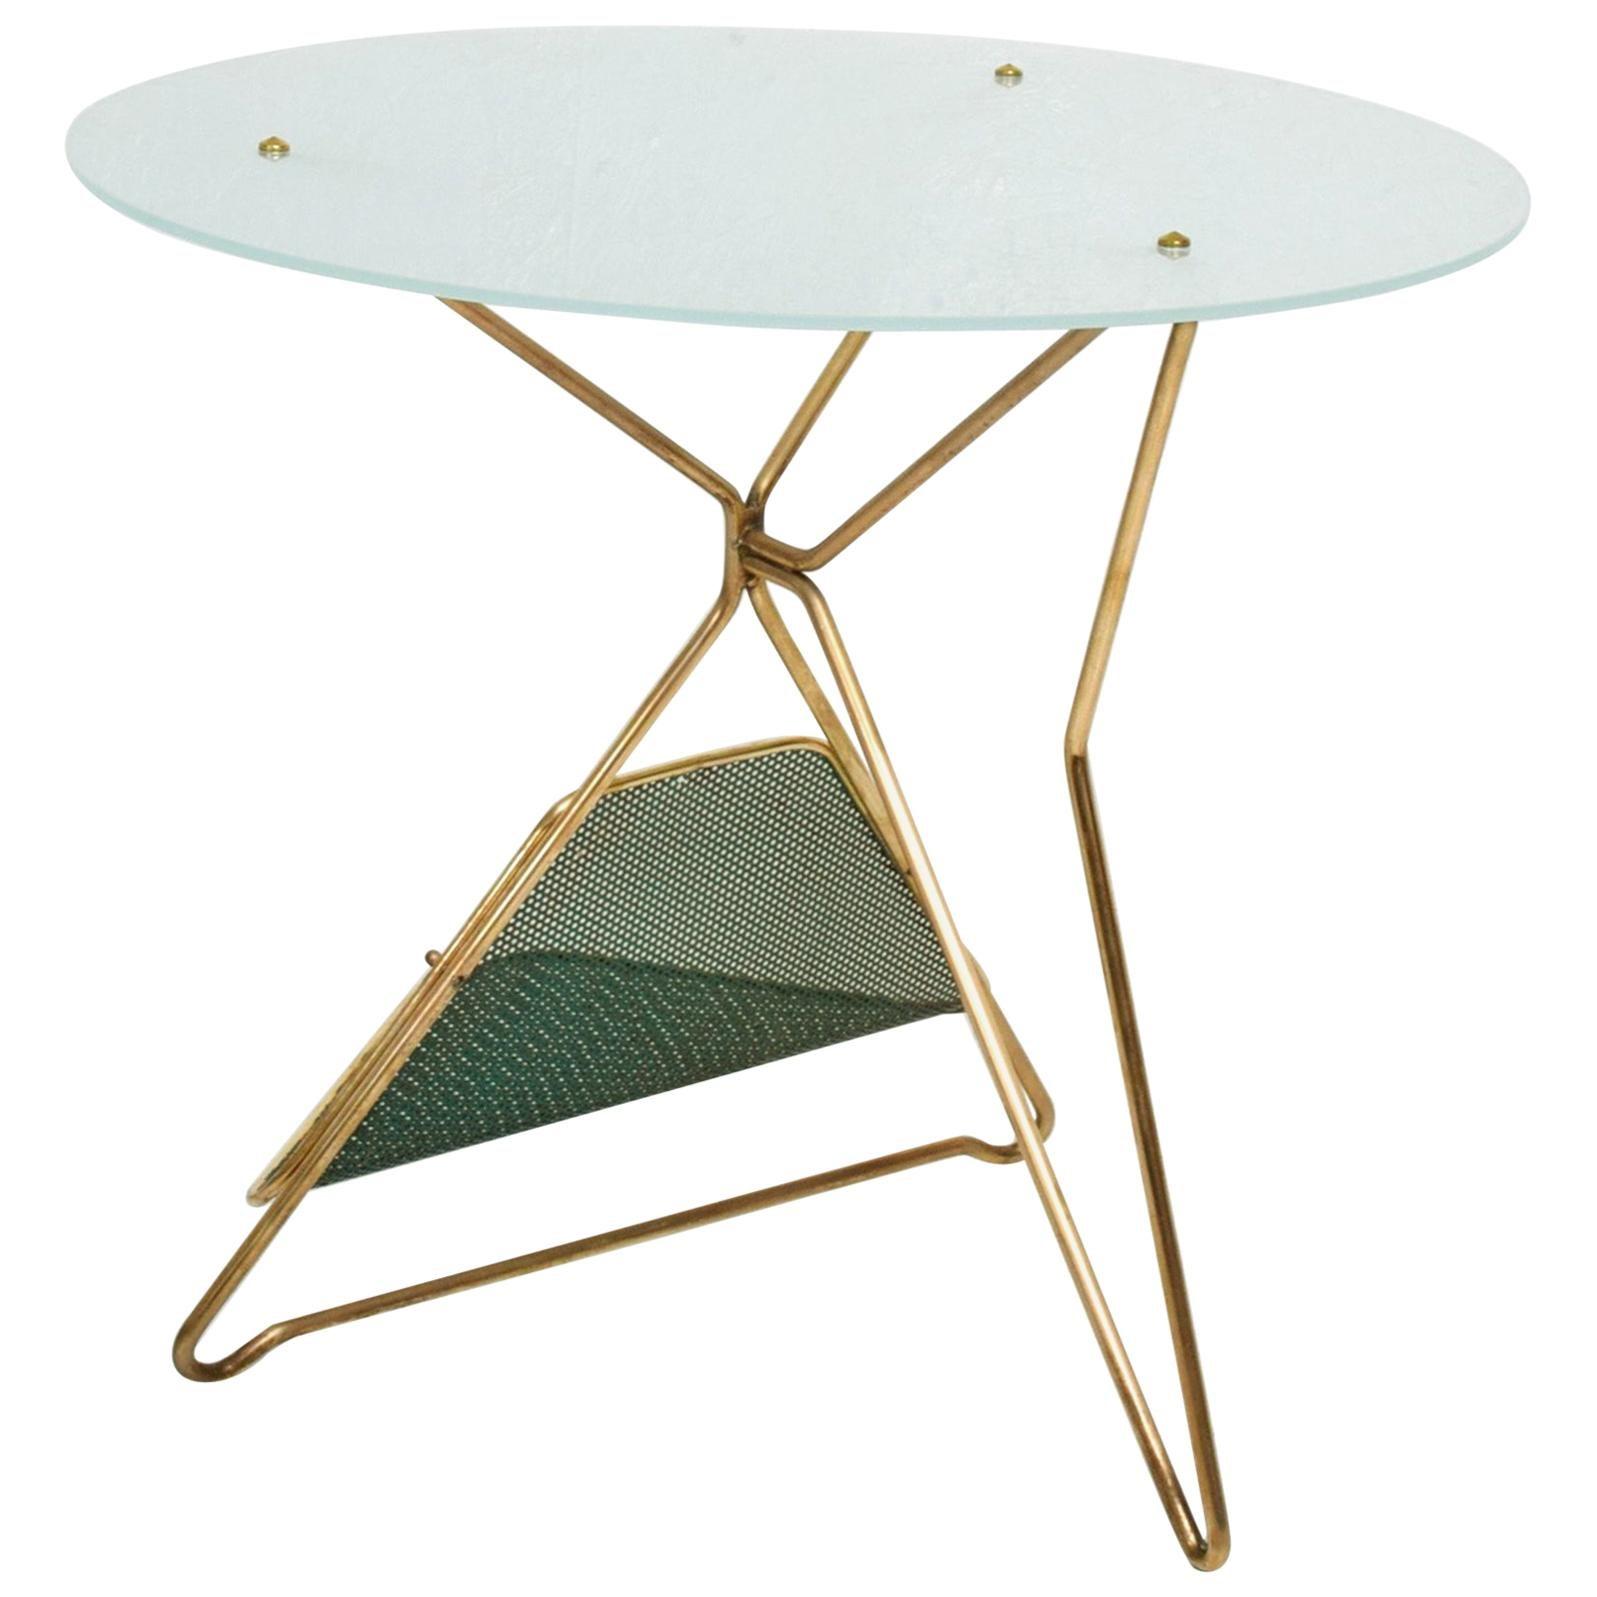 Gio Ponti Italy Artful Italian Brass Side Table with Green Magazine Holder 1950s